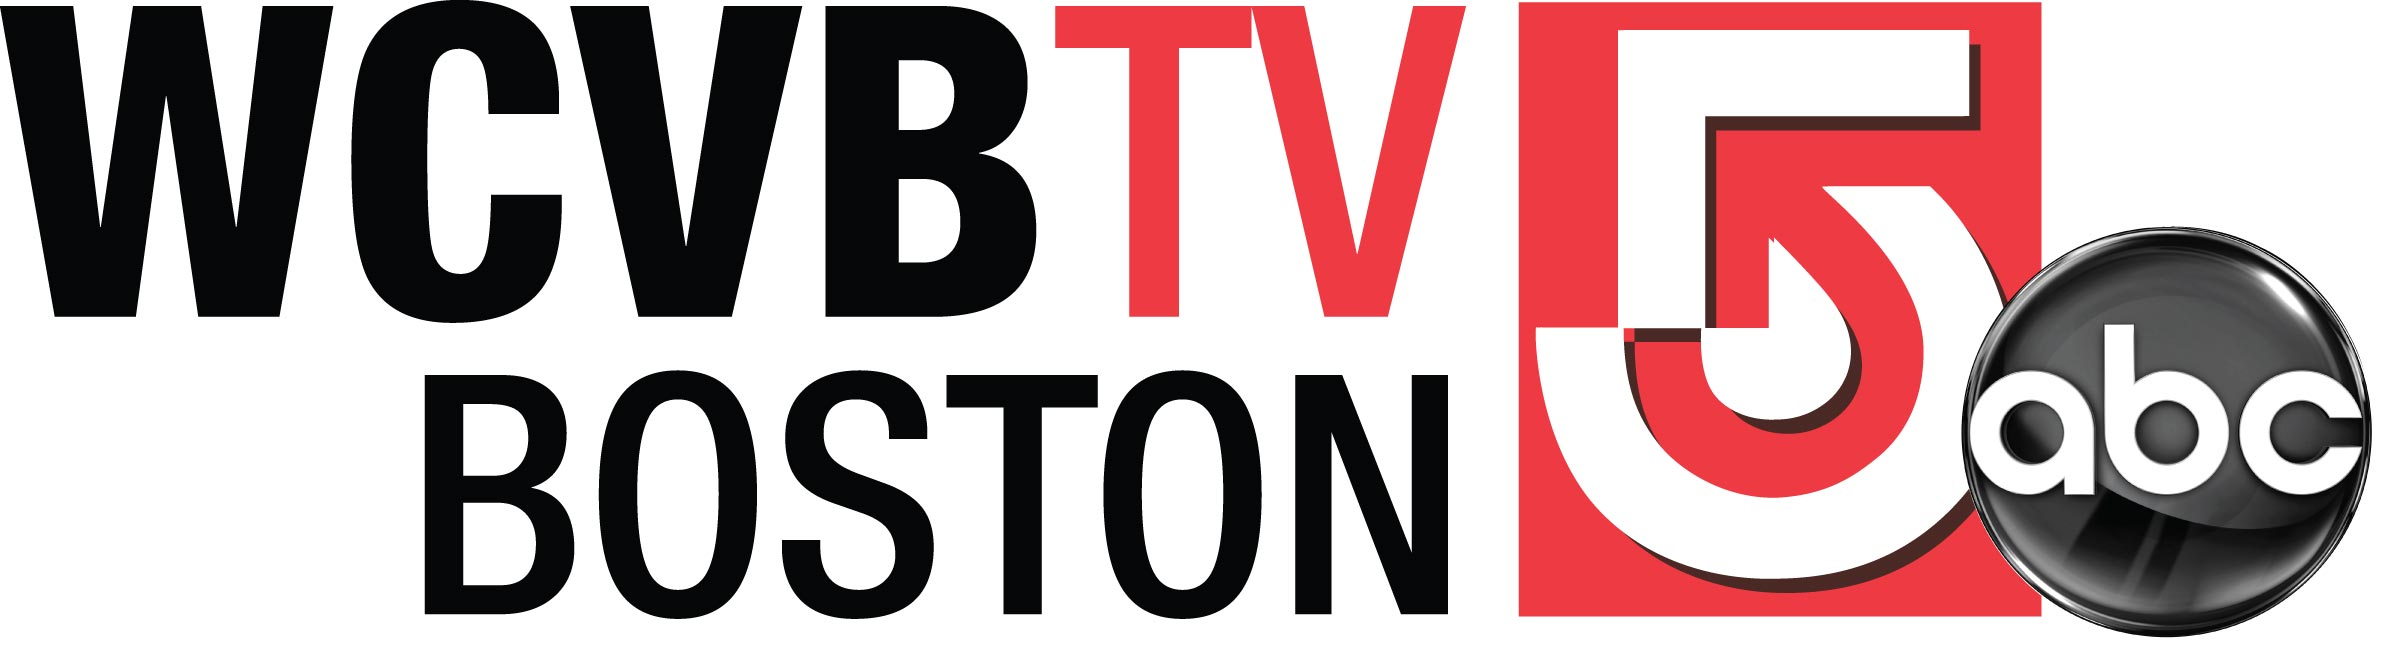 WCVB_5_logo.jpg